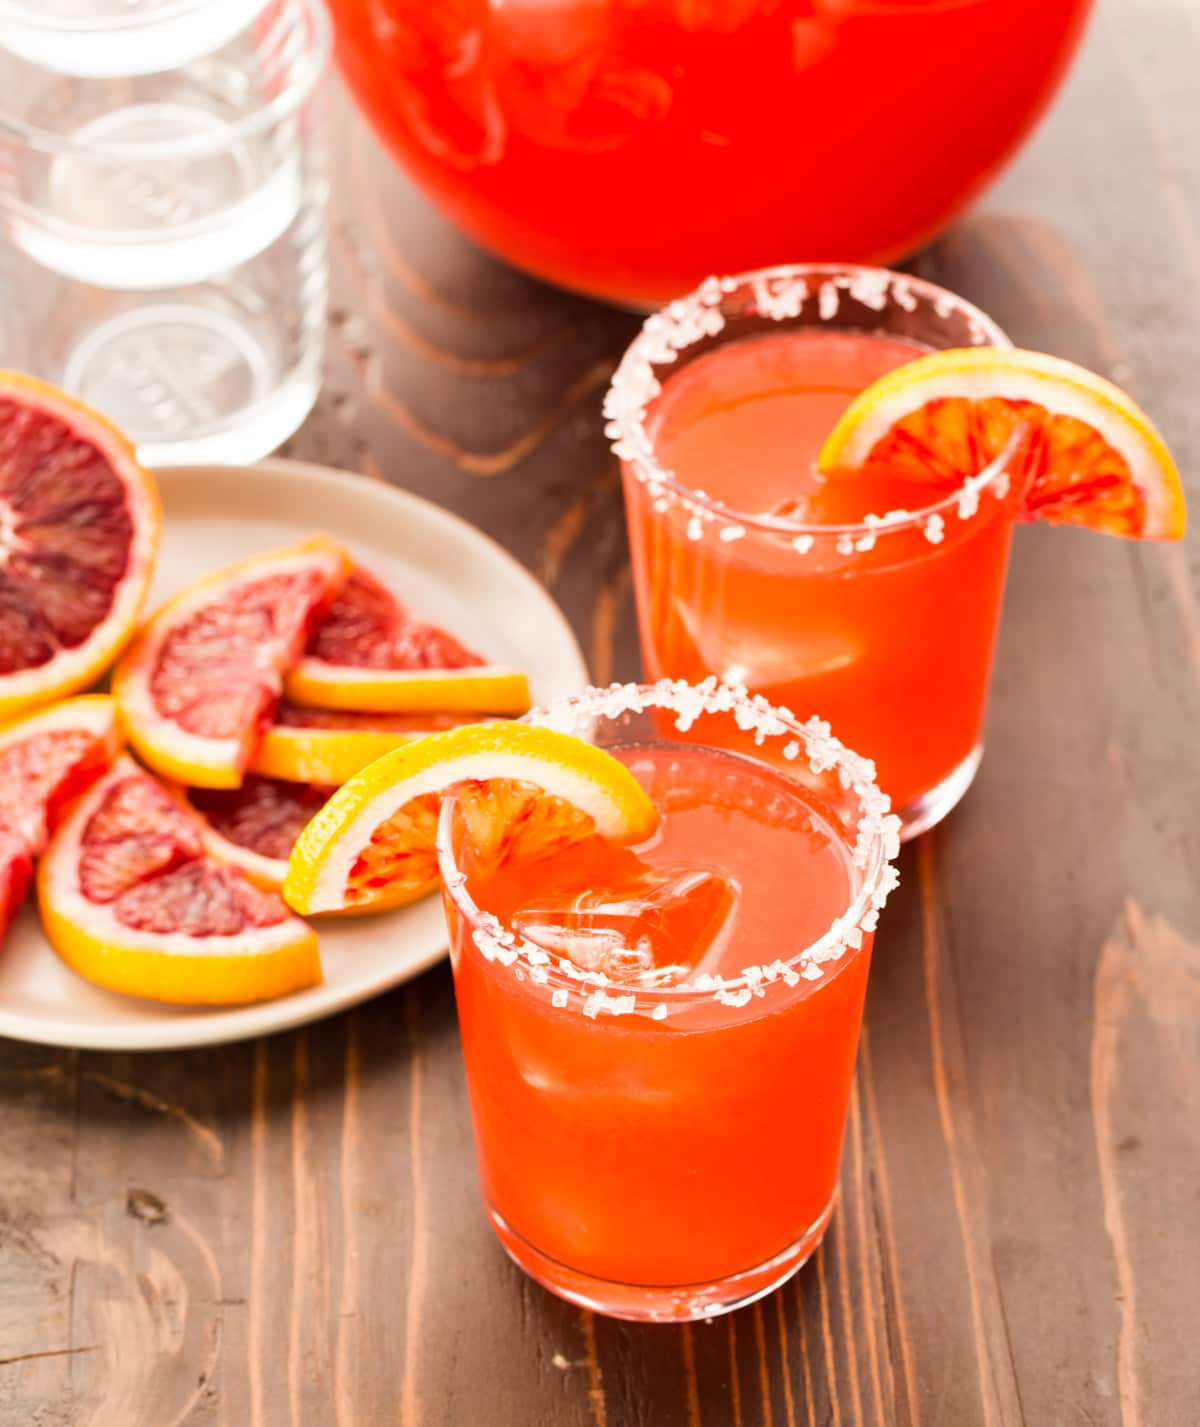 Blood Orange Margaritas - 10 Margaritas For Cinco de Mayo